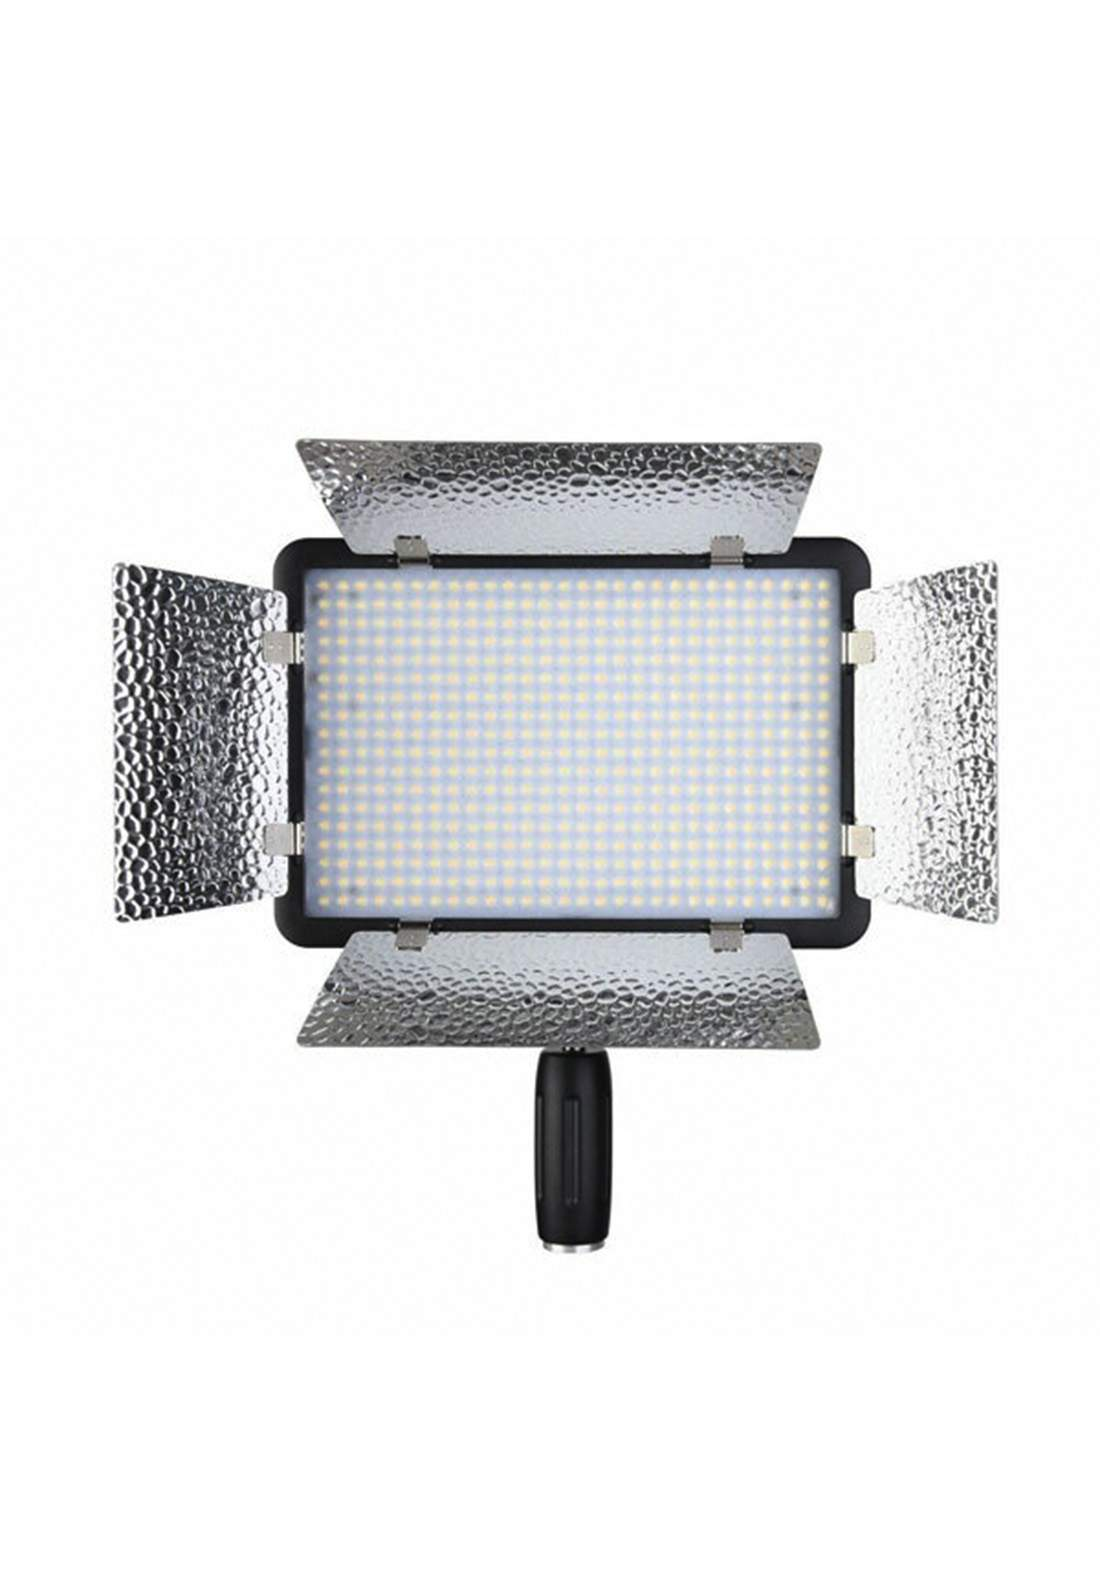 Godox LED500LRC Changeable Version On-Camera LED Video Panel Light اضاءة فلاش للتصوير